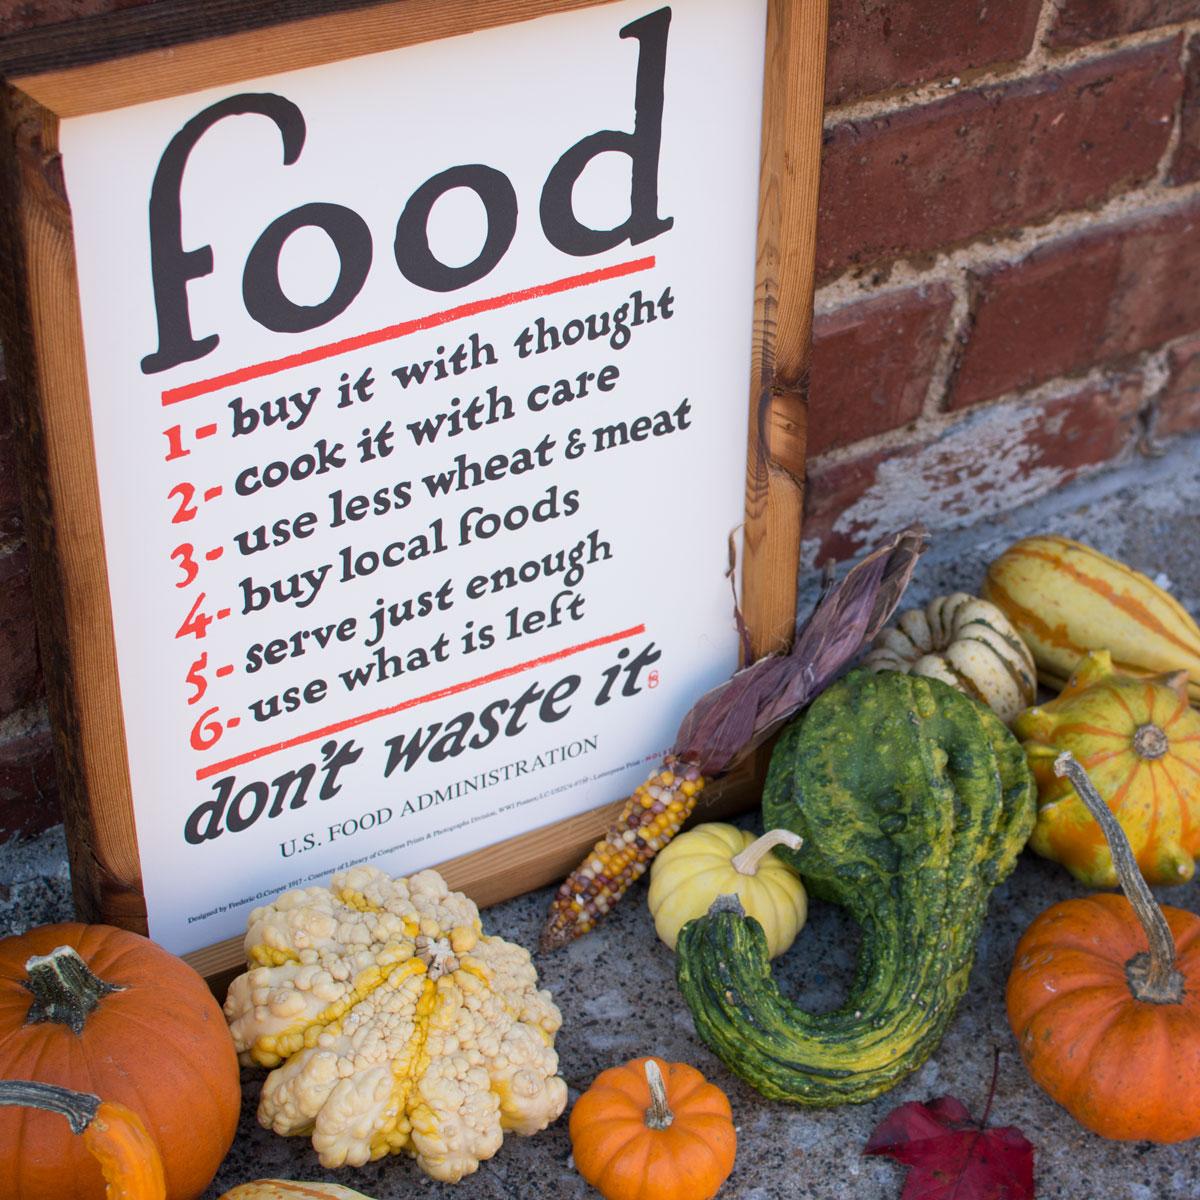 lg-food-rules-brick-wall-left-angle-square-1200px.jpg